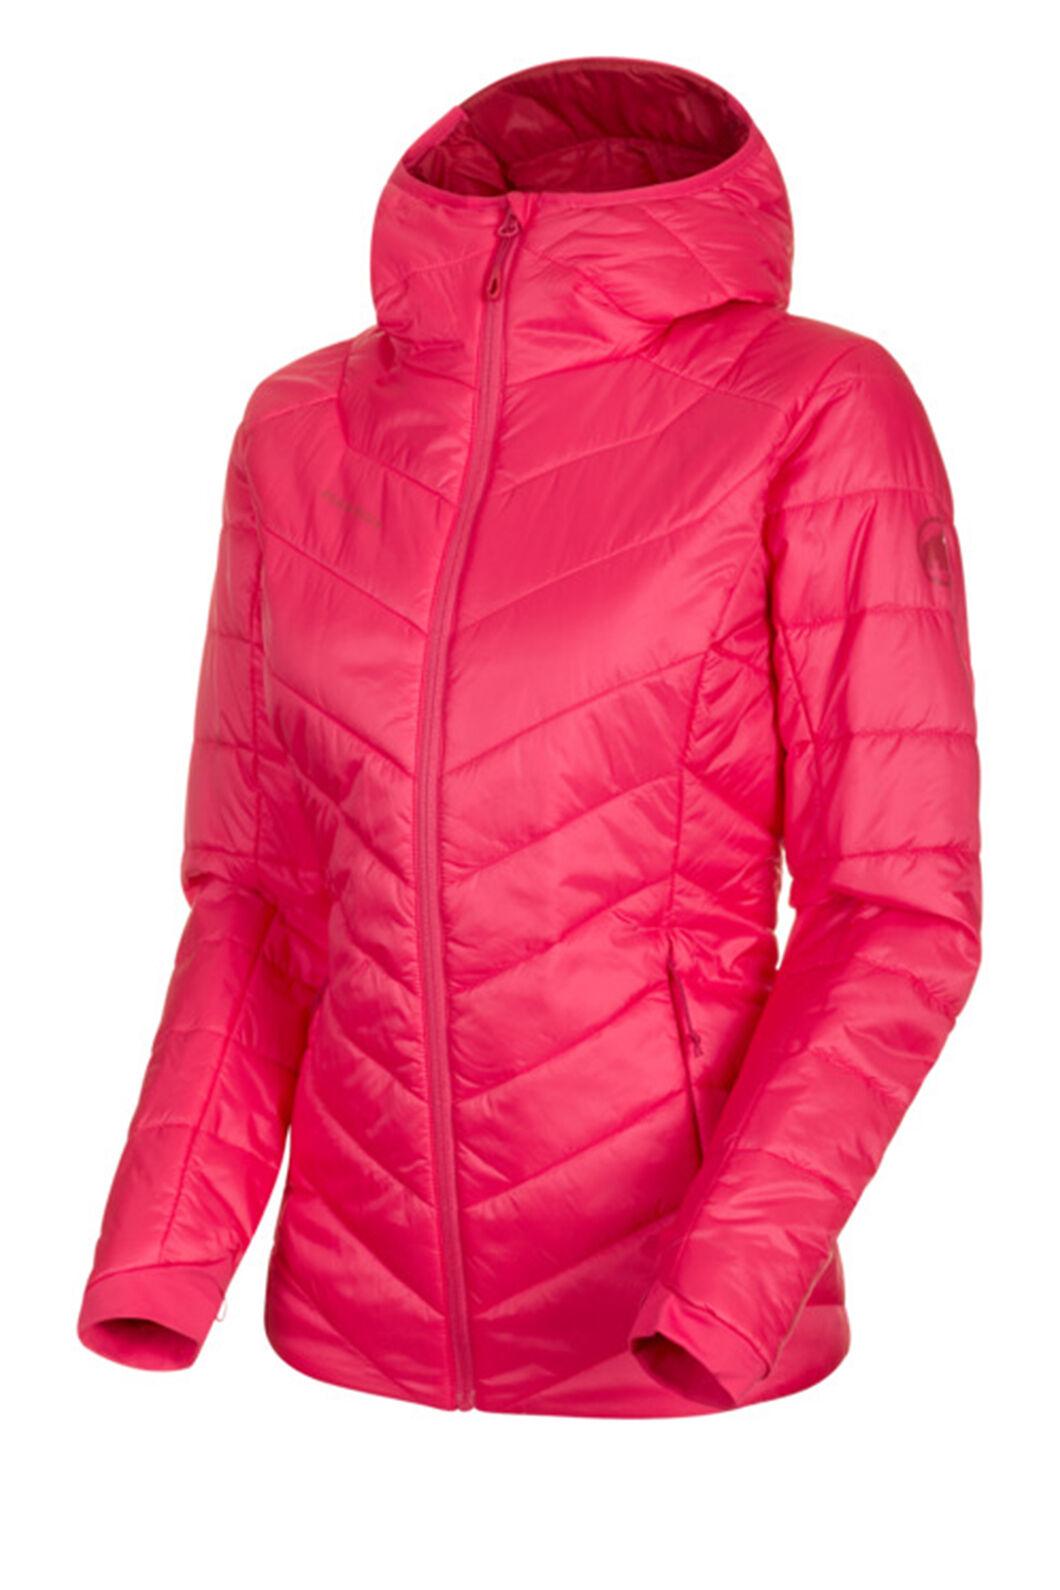 Mammut Rime Hooded Insulation Jacket — Women's, Dragonfruit/Scooter, hi-res